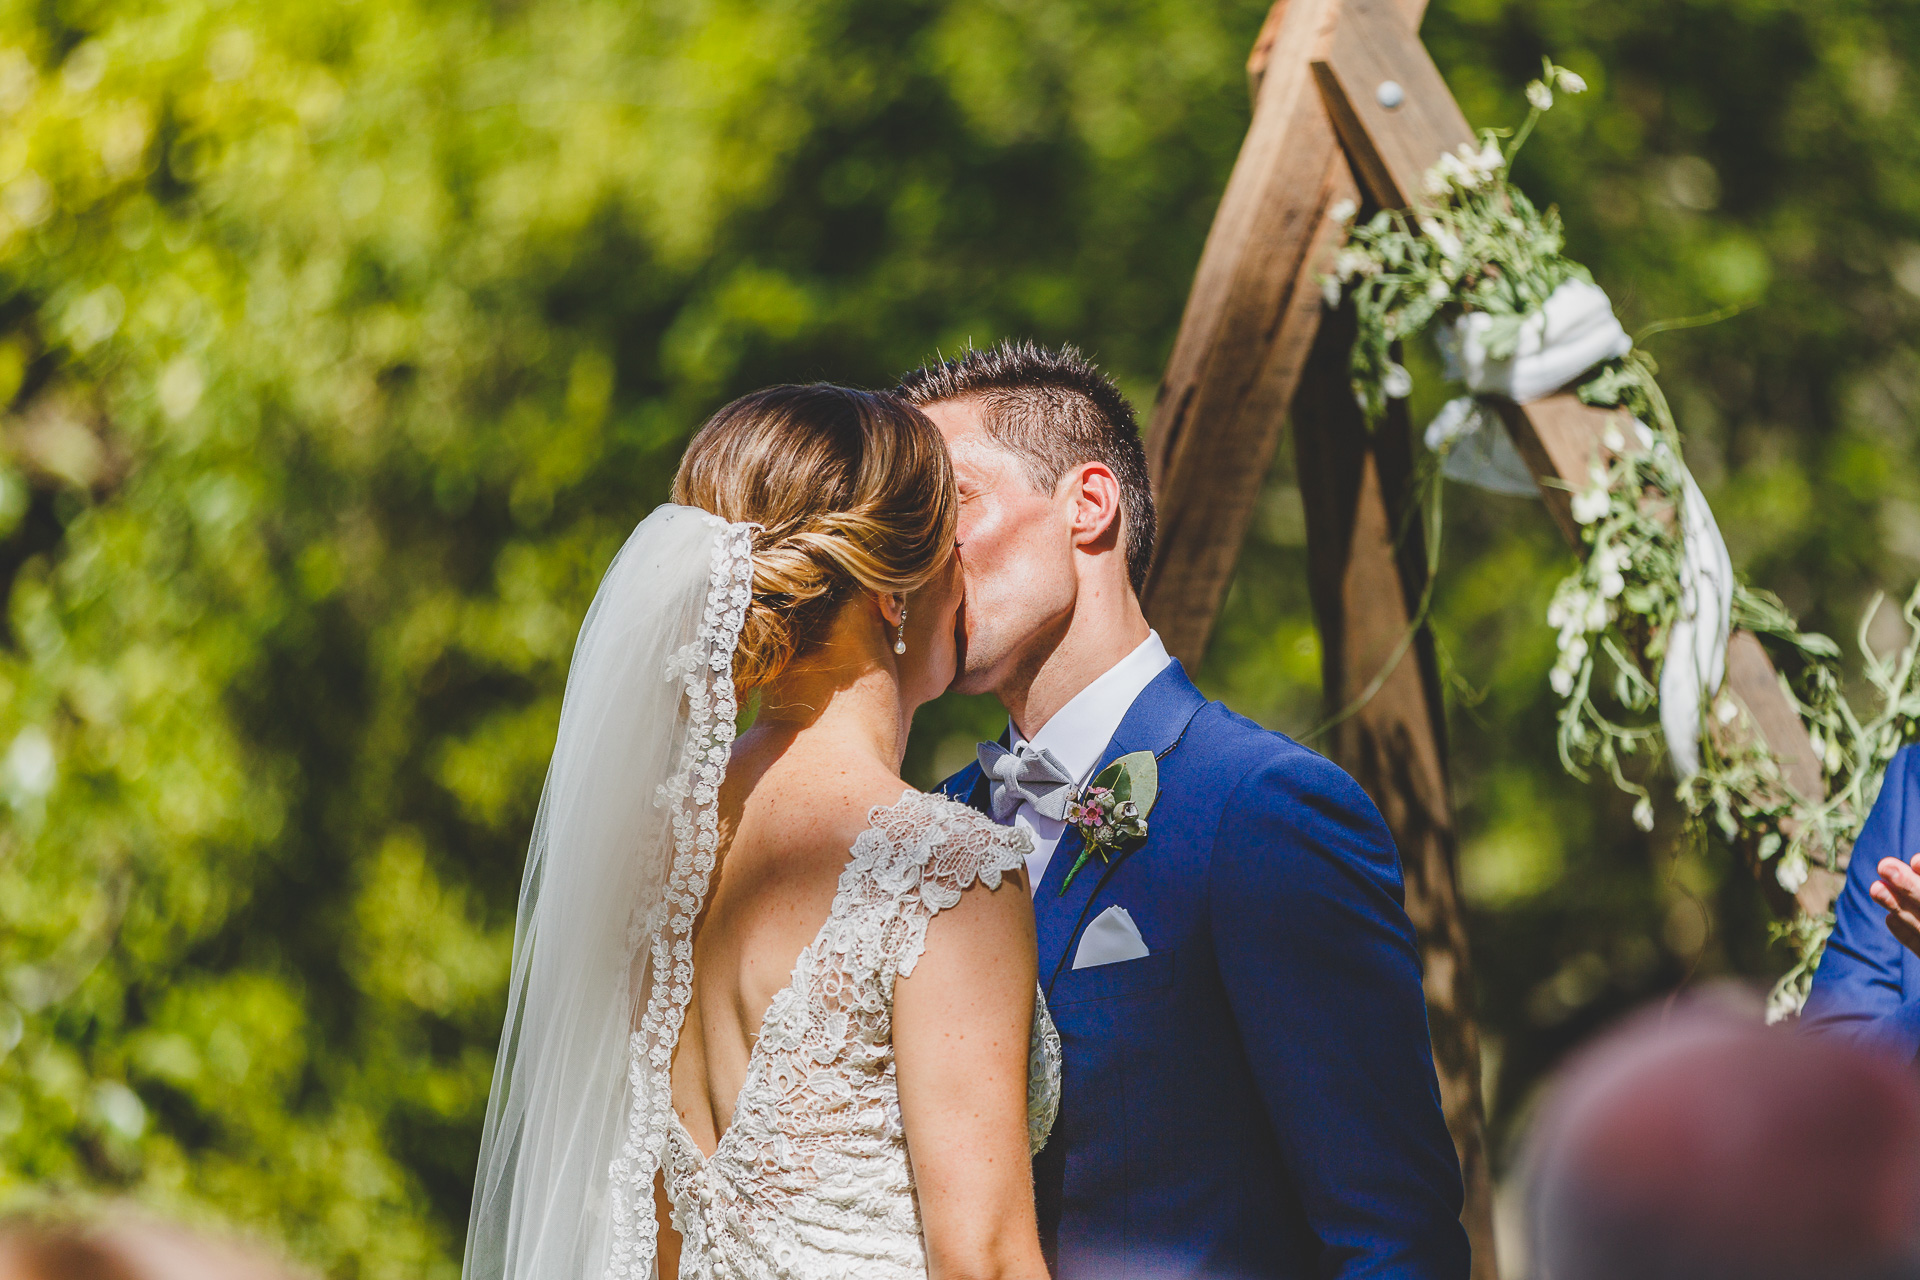 20161112 - Heath_Ruth_Wombat_Hollow_Wedding | 175.jpg